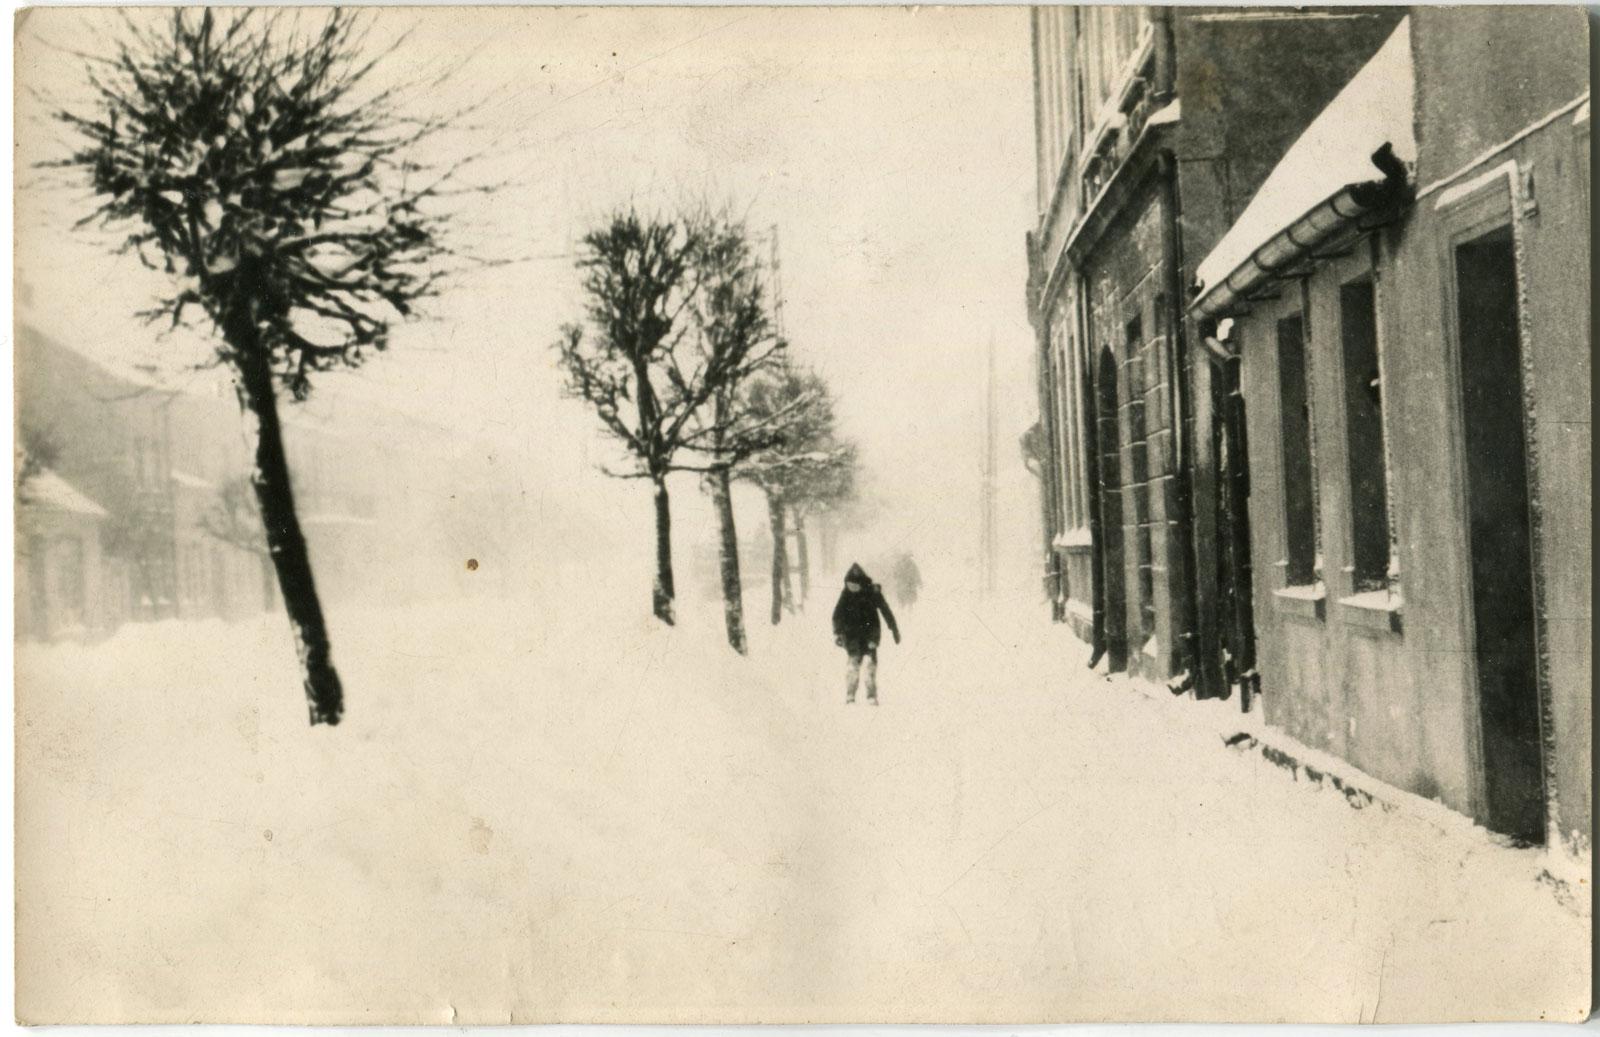 ul. Poznańska Kórnik 1964 rok - zima